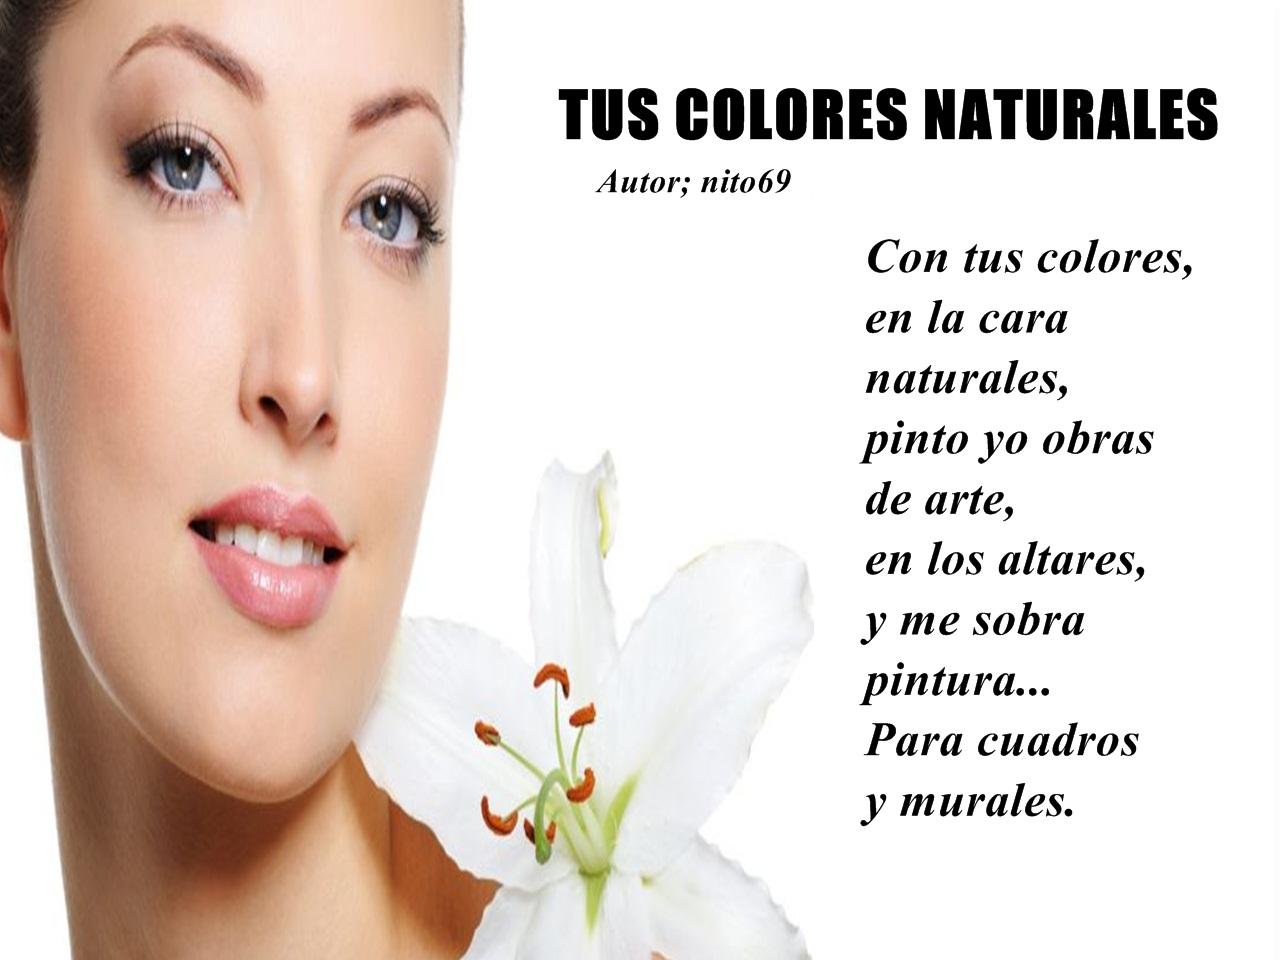 TUS COLORES NATURALES